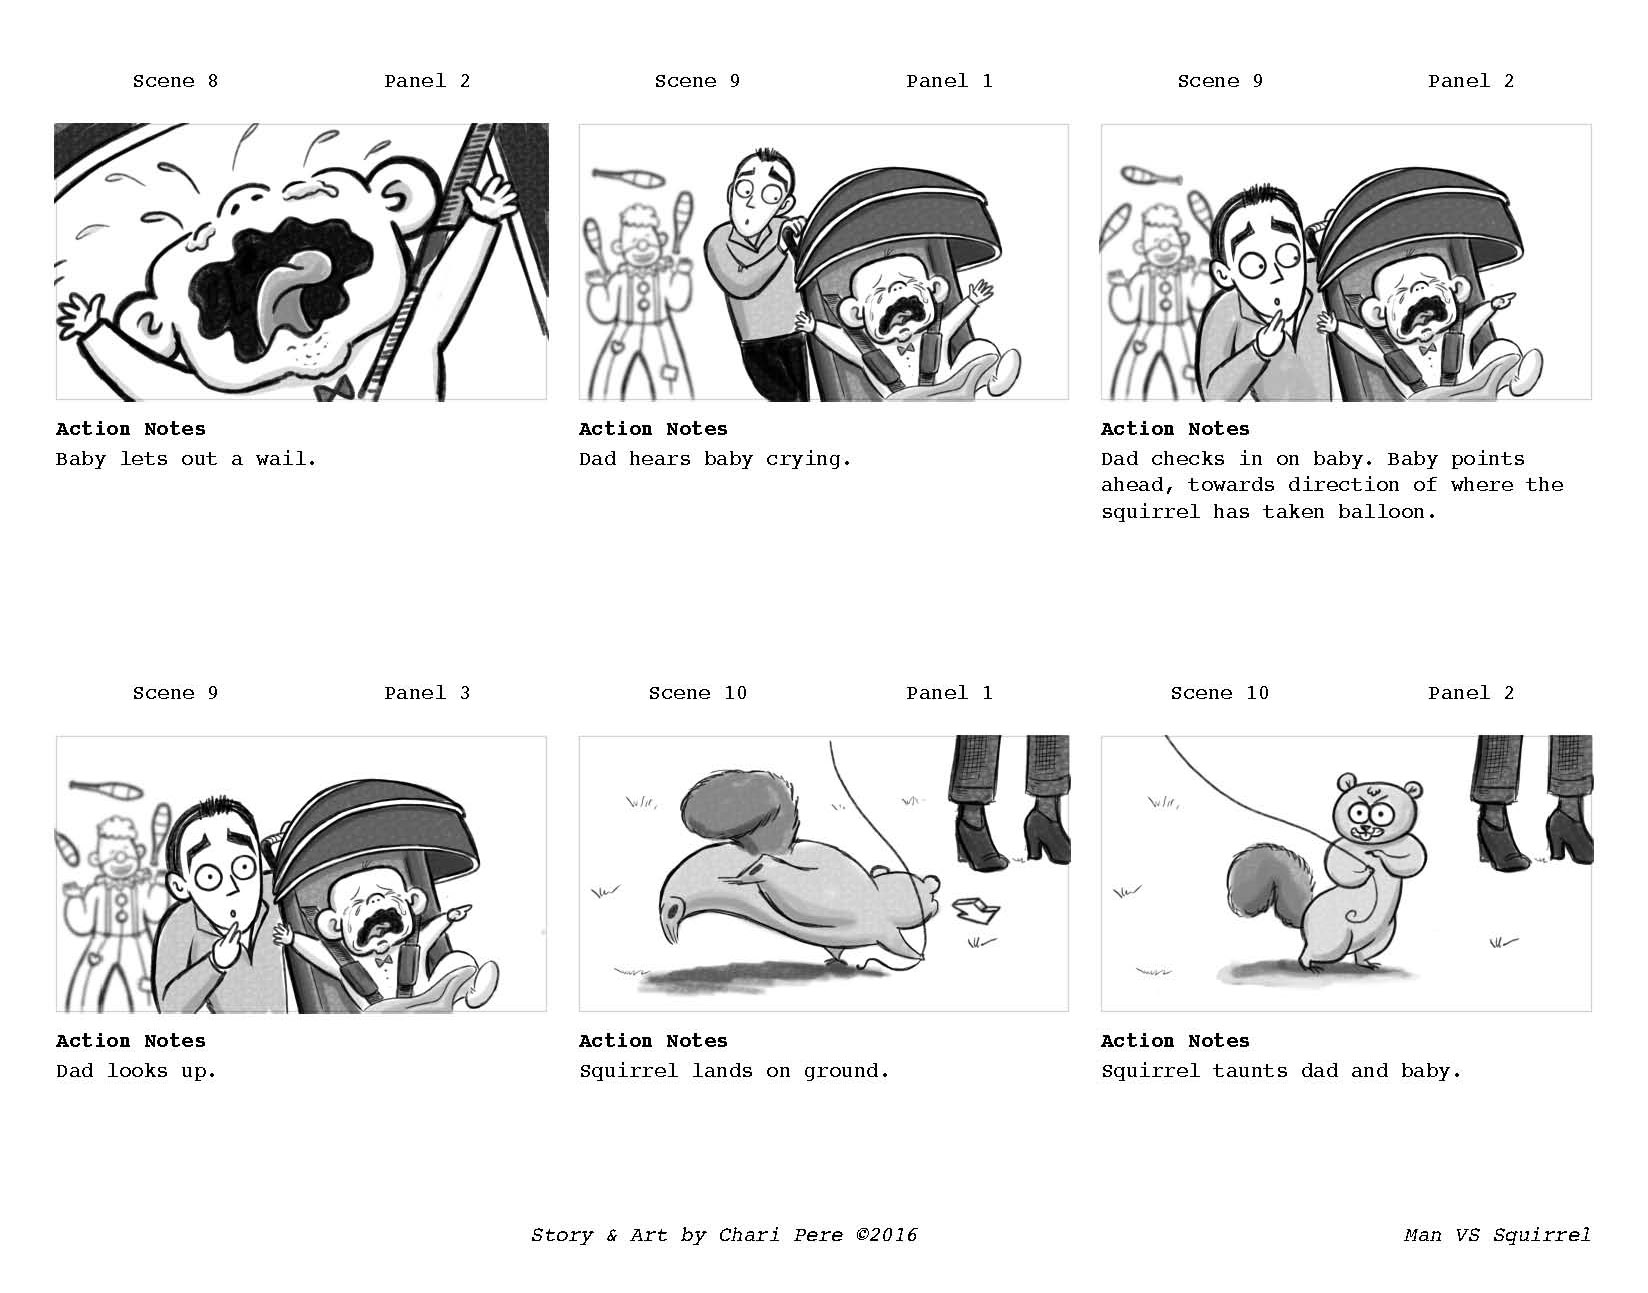 Man VS Squirrel Storyboards